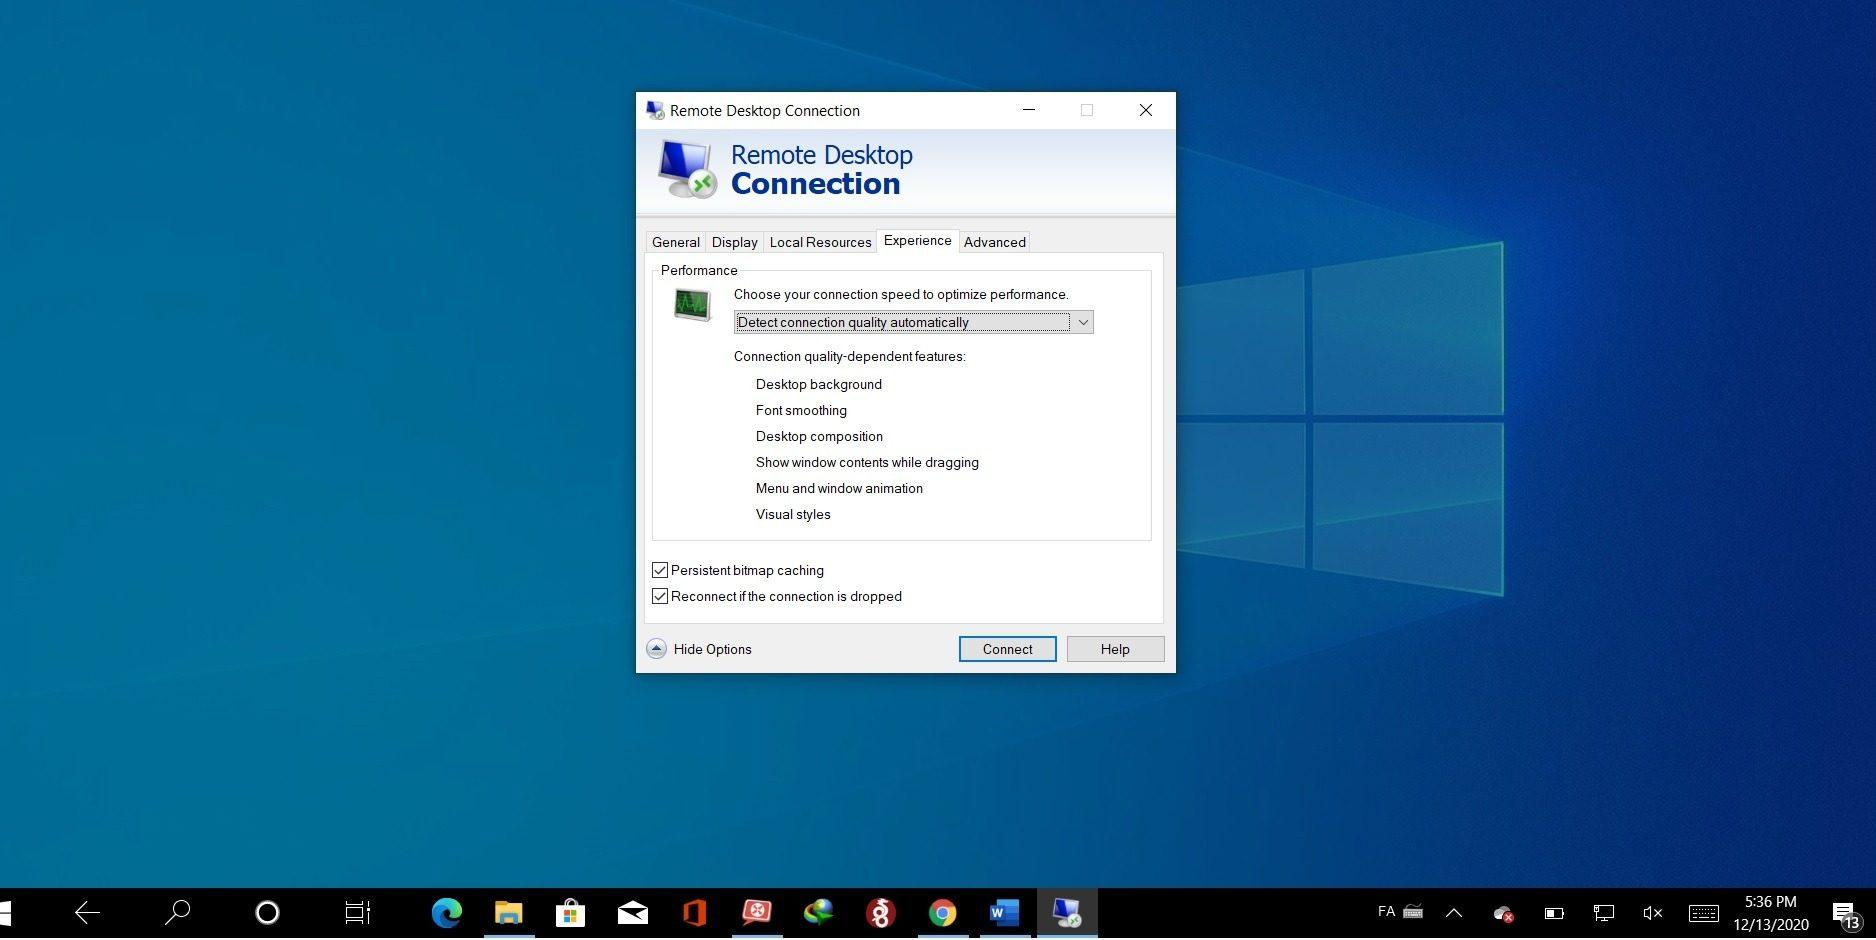 change remote desktop connection settings